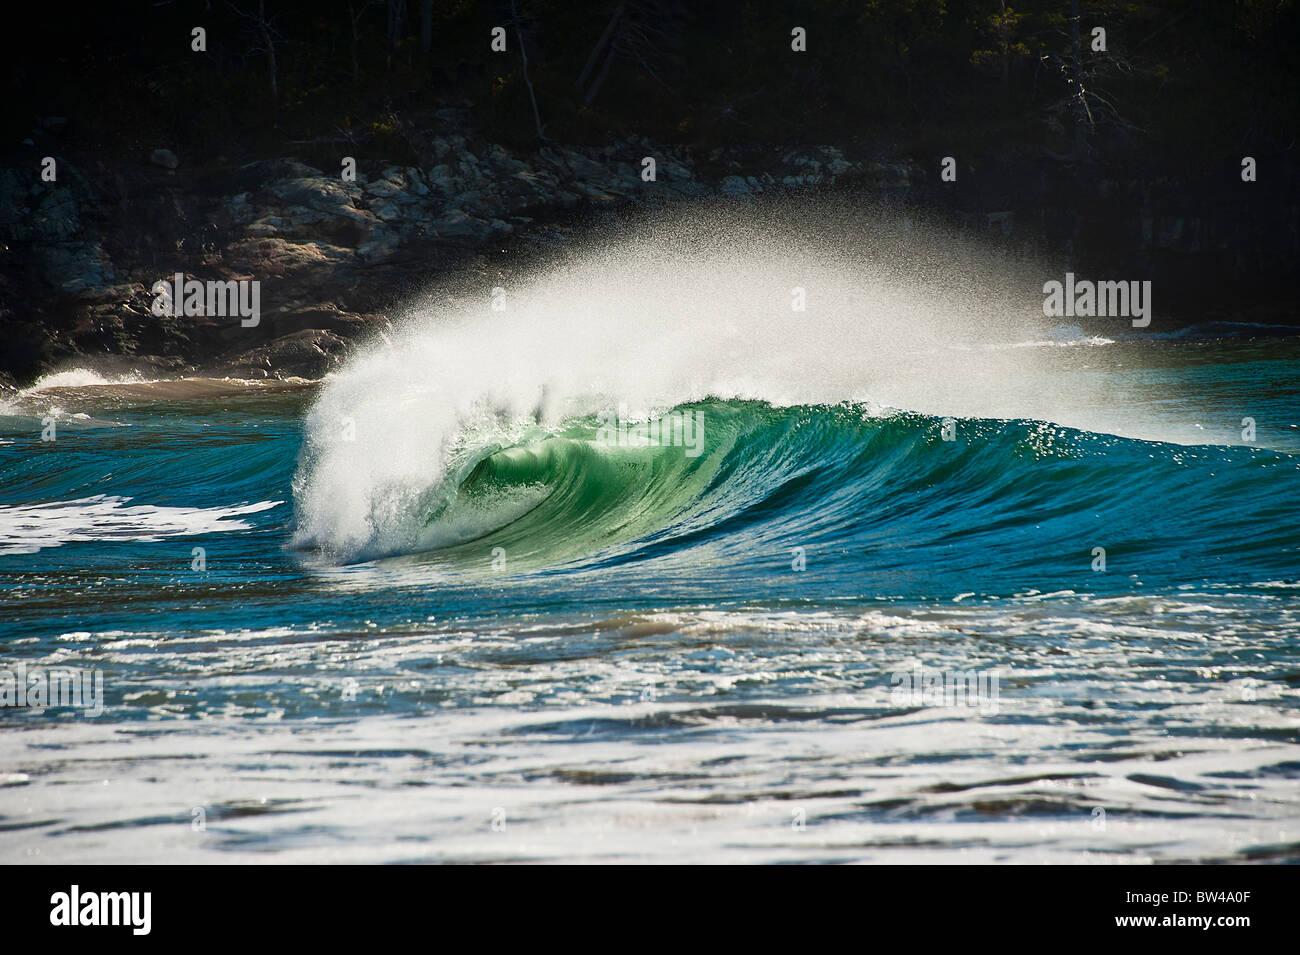 Wave breaking, Sand Beach, Acadia NP, Maine, USA - Stock Image